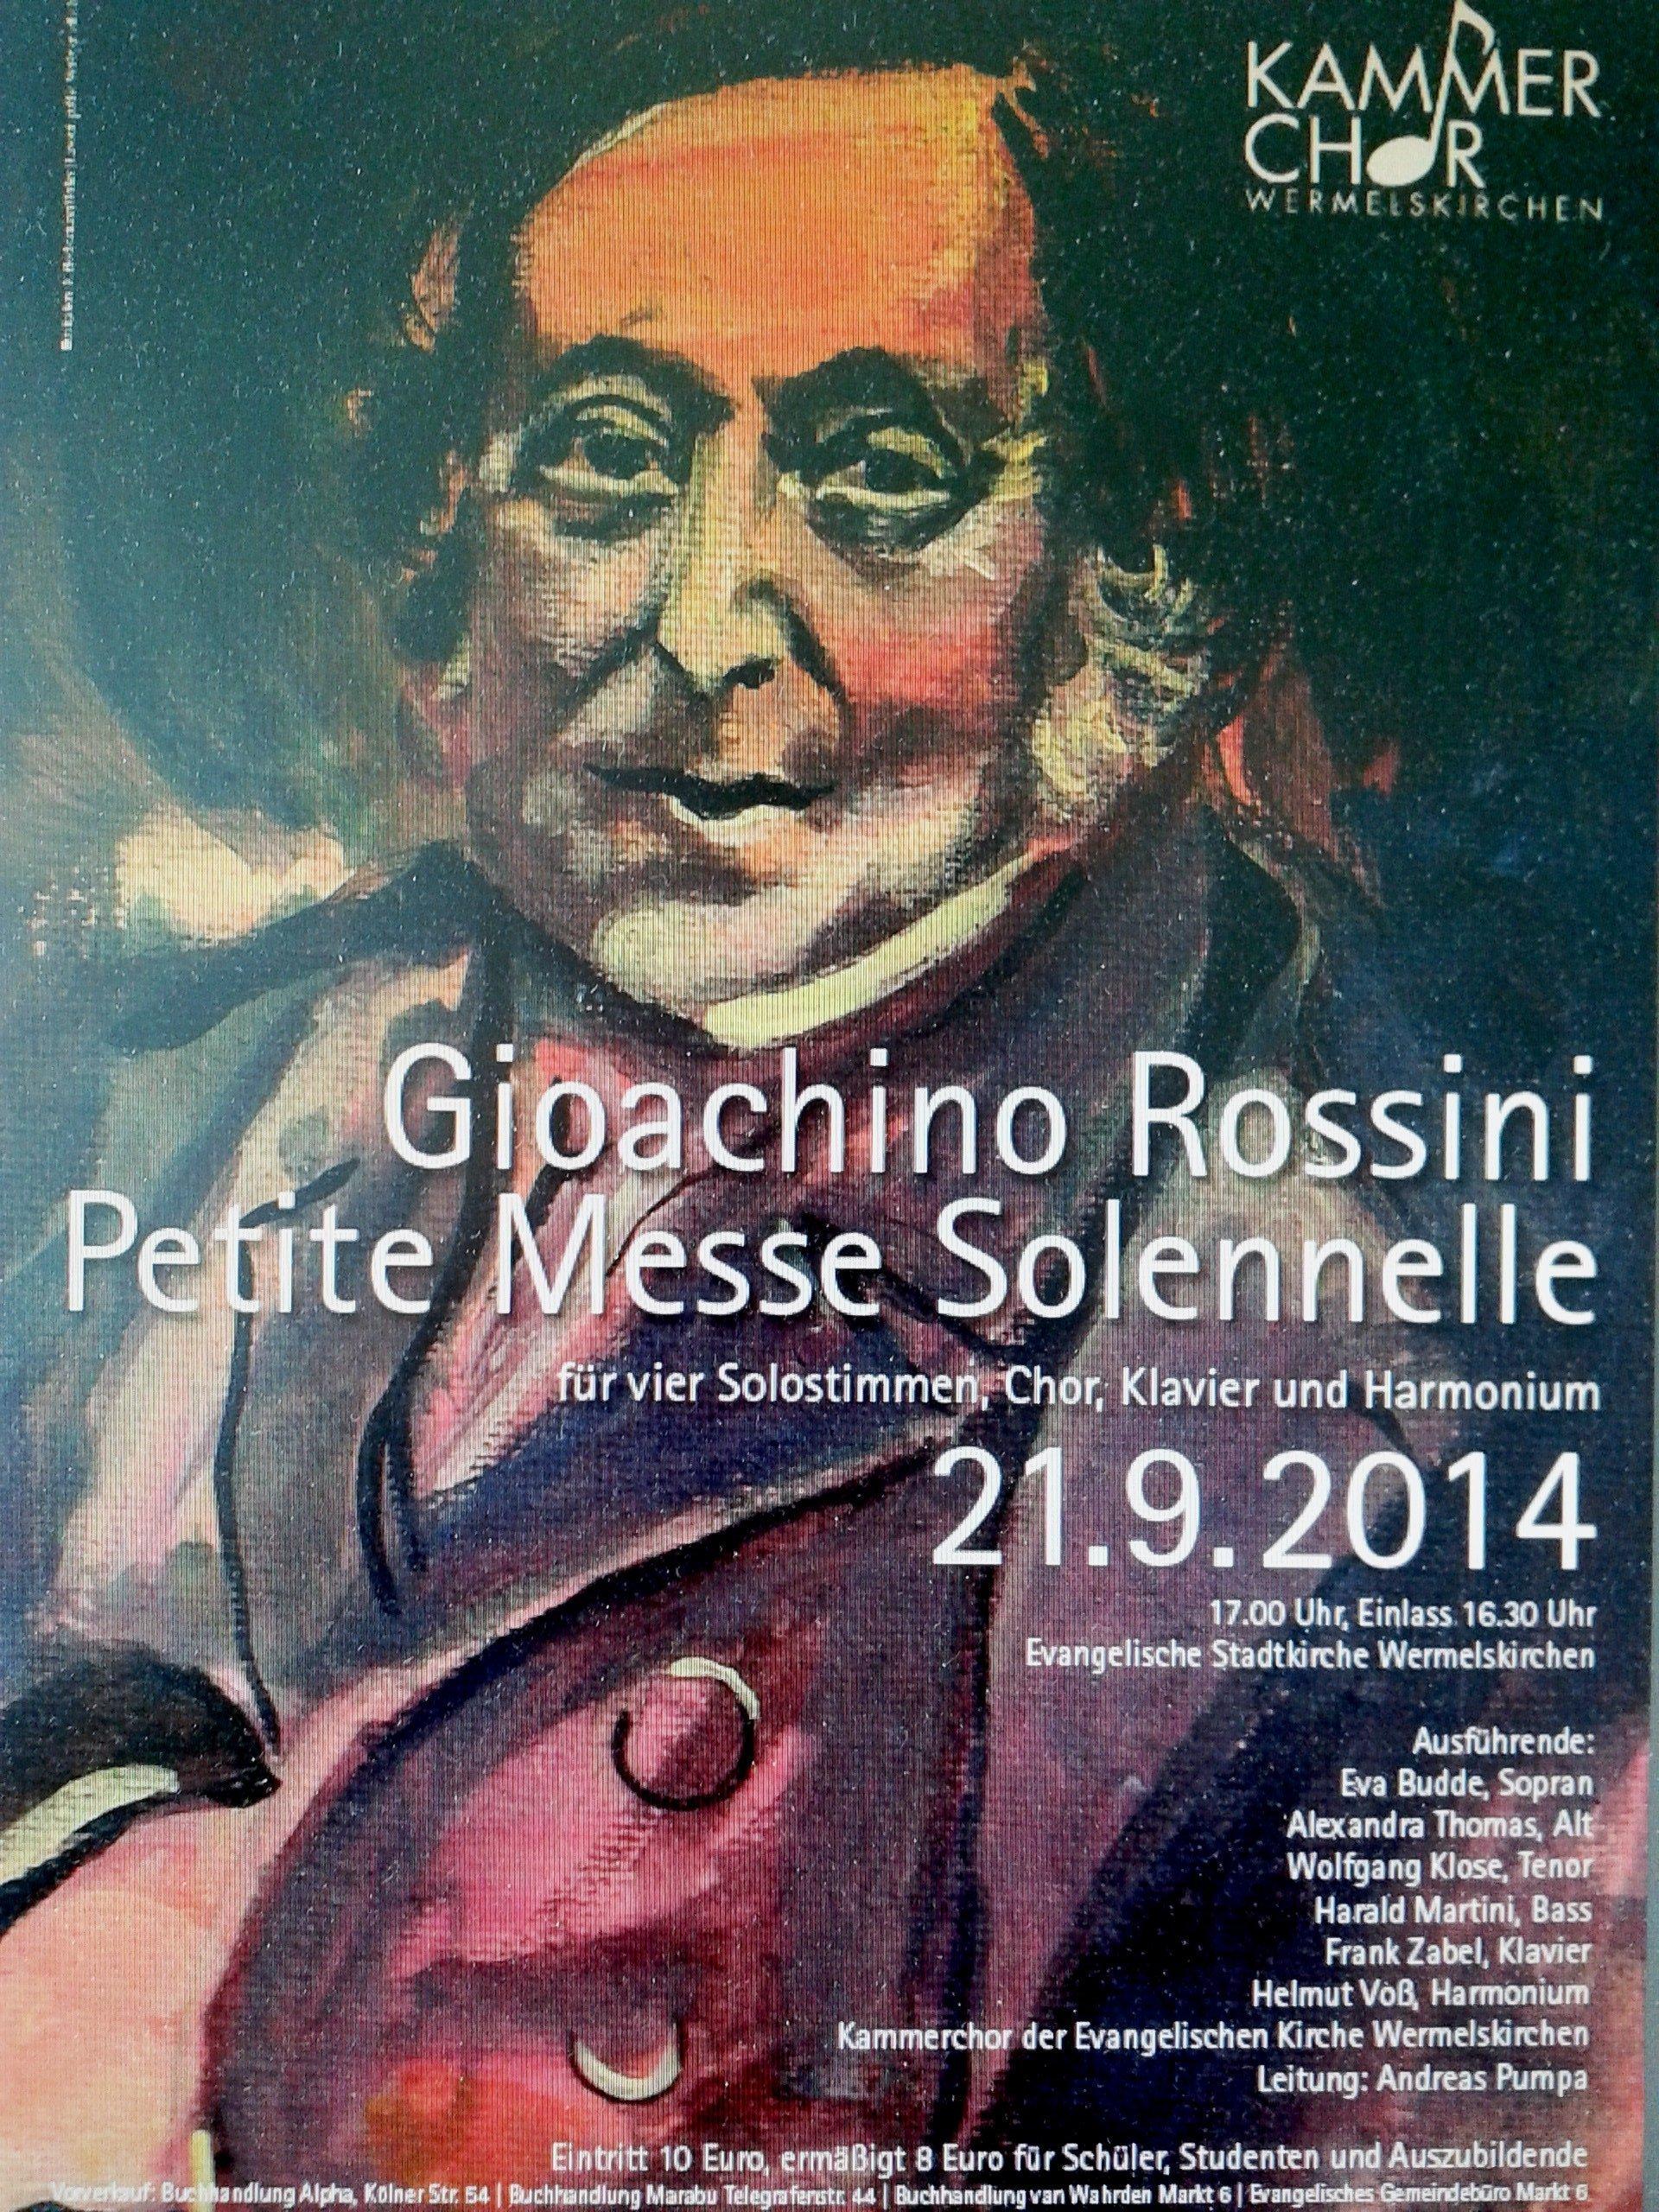 Rossini Messe Kammerchor 2014